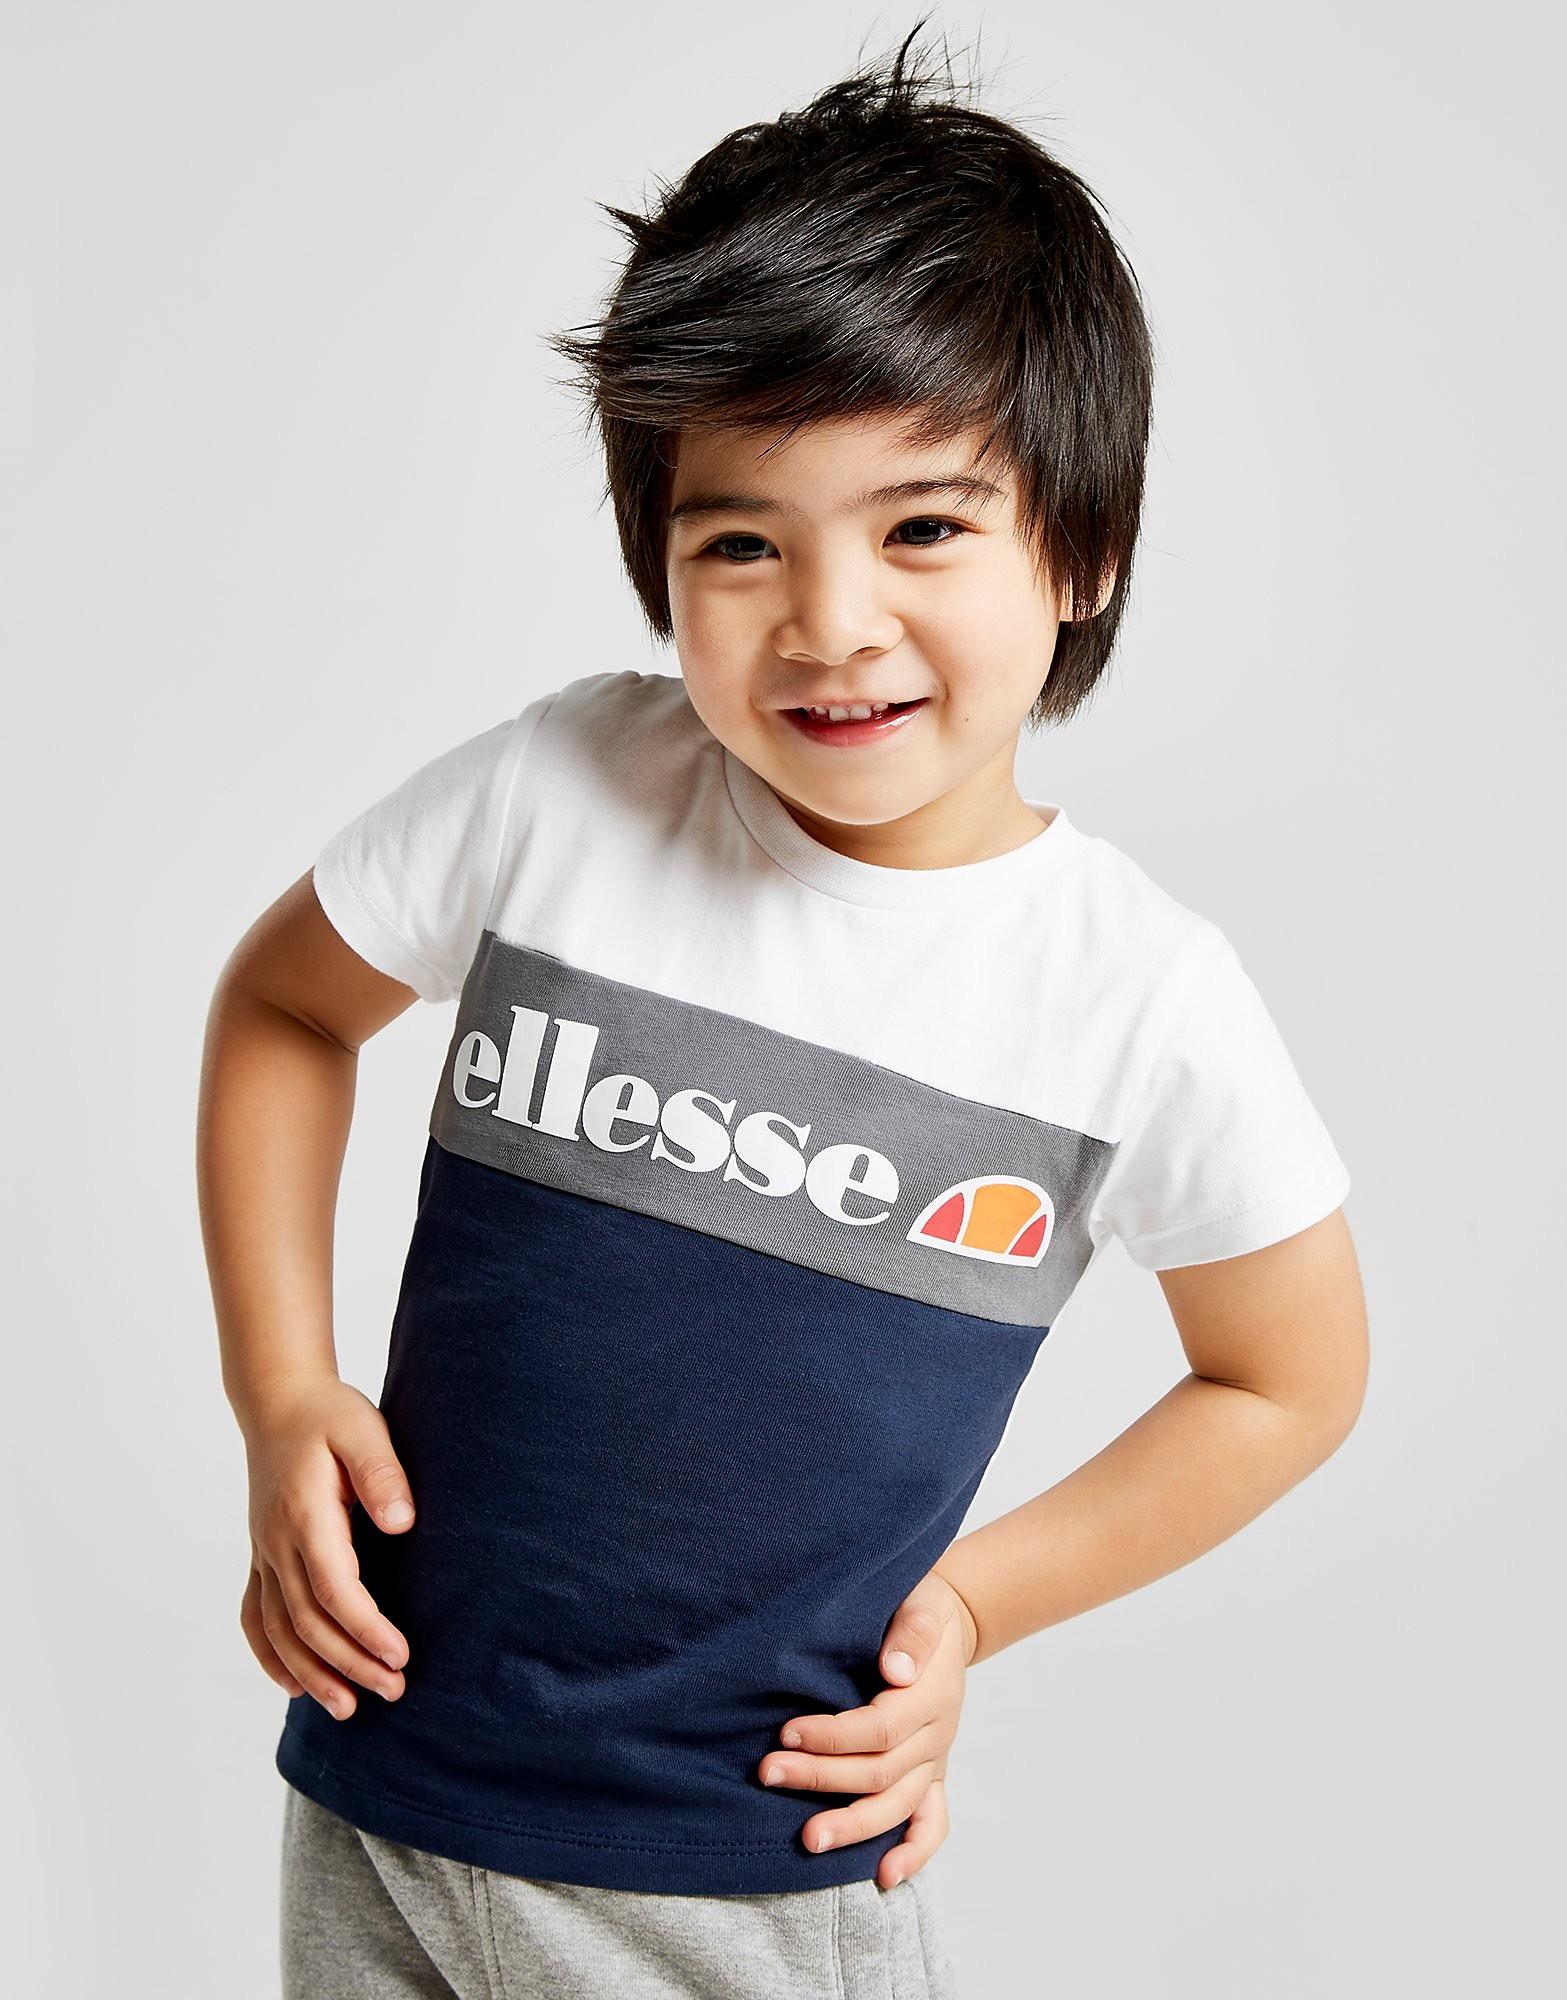 Ellesse Centio Colour Block T-Shirt Infant - alleen bij JD - Blauw - Kind